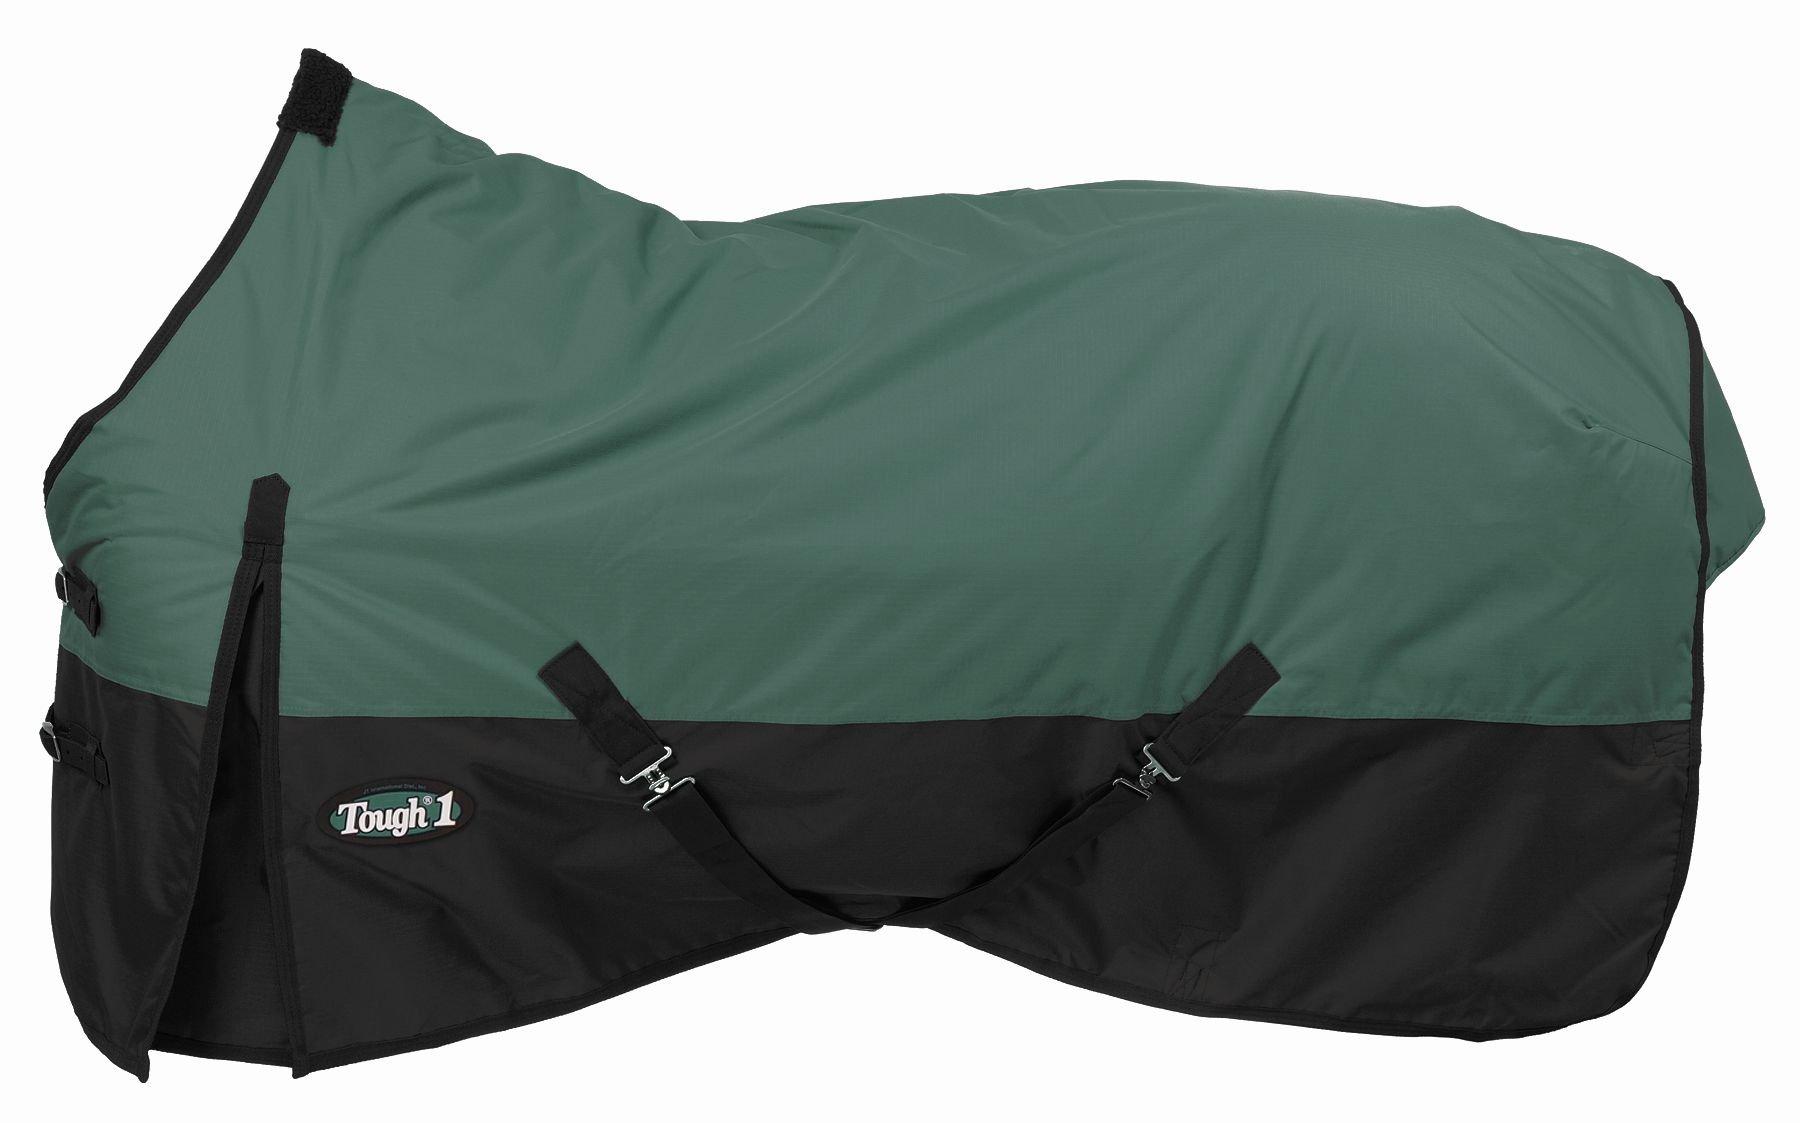 Tough 1 600 Denier Waterproof Horse Sheet, Hunter Green, 78-Inch